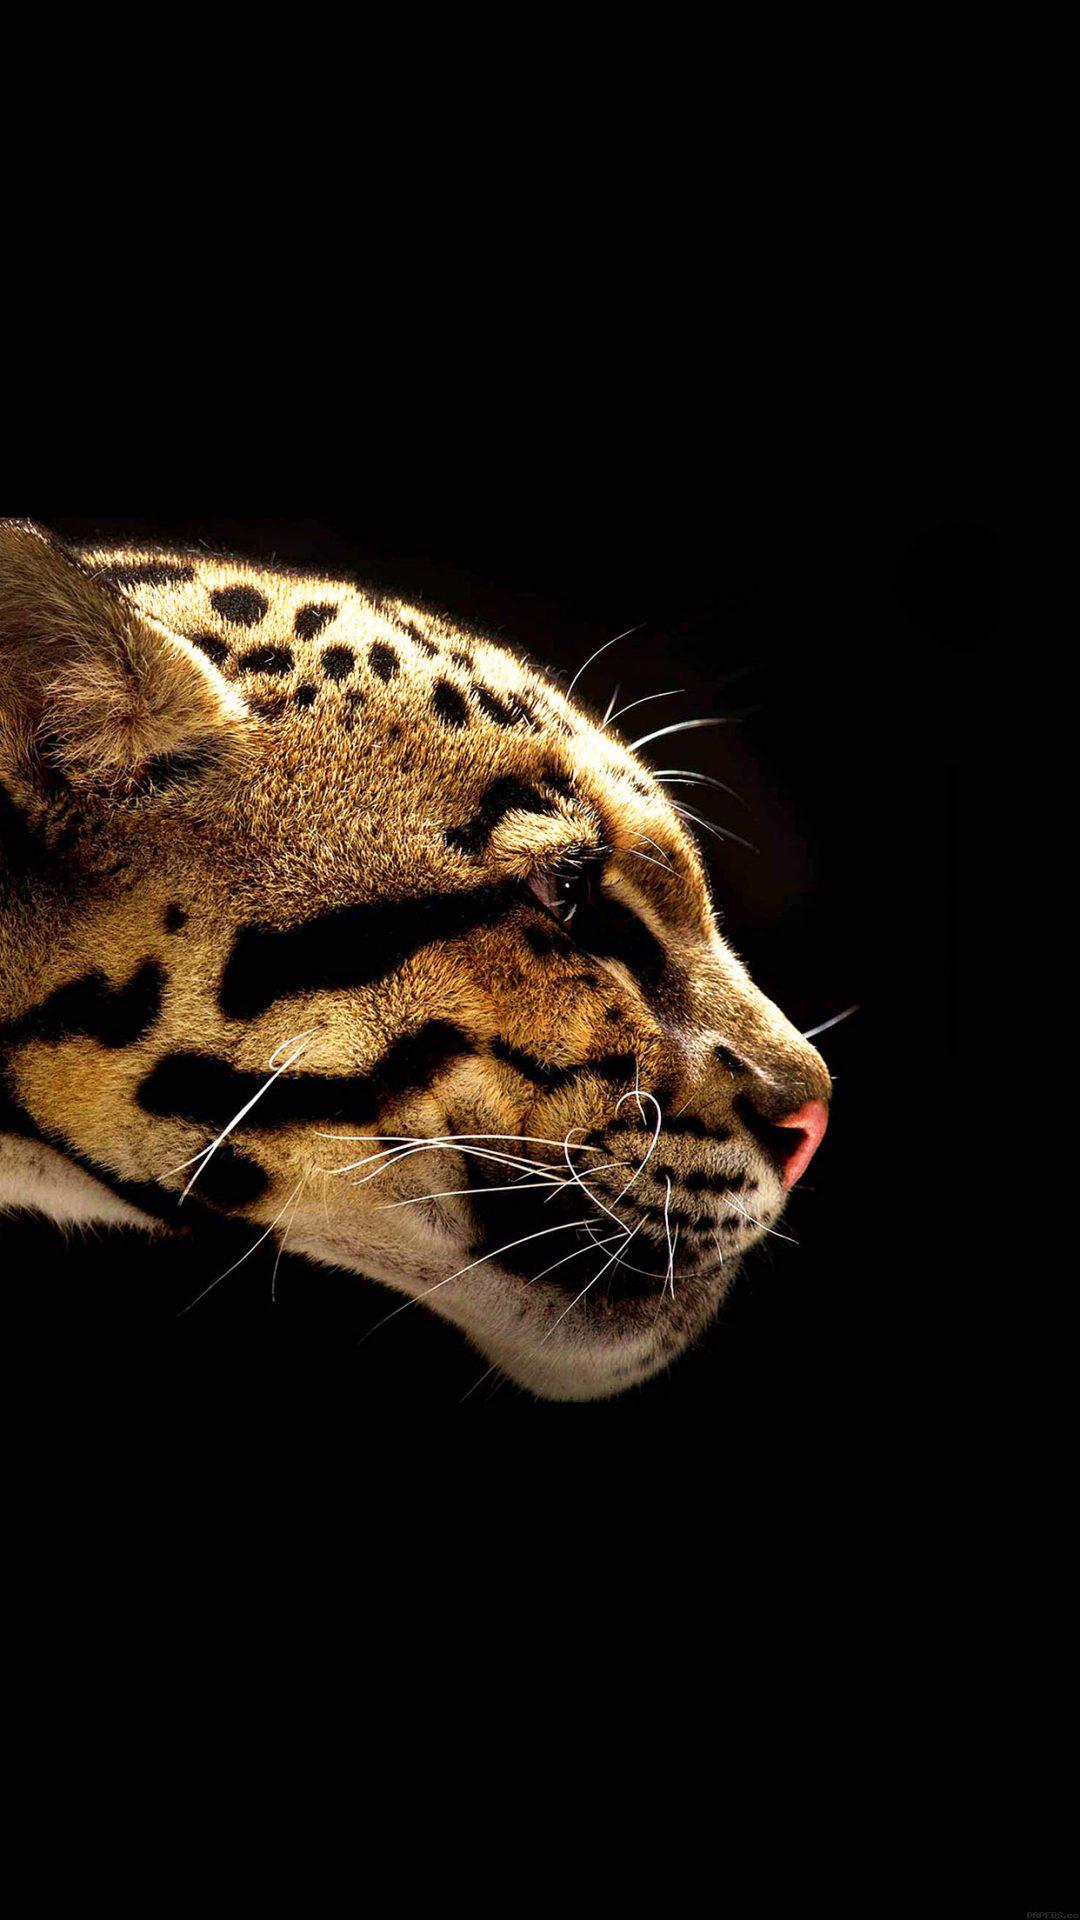 Wallpaper Wild Cat B Animal